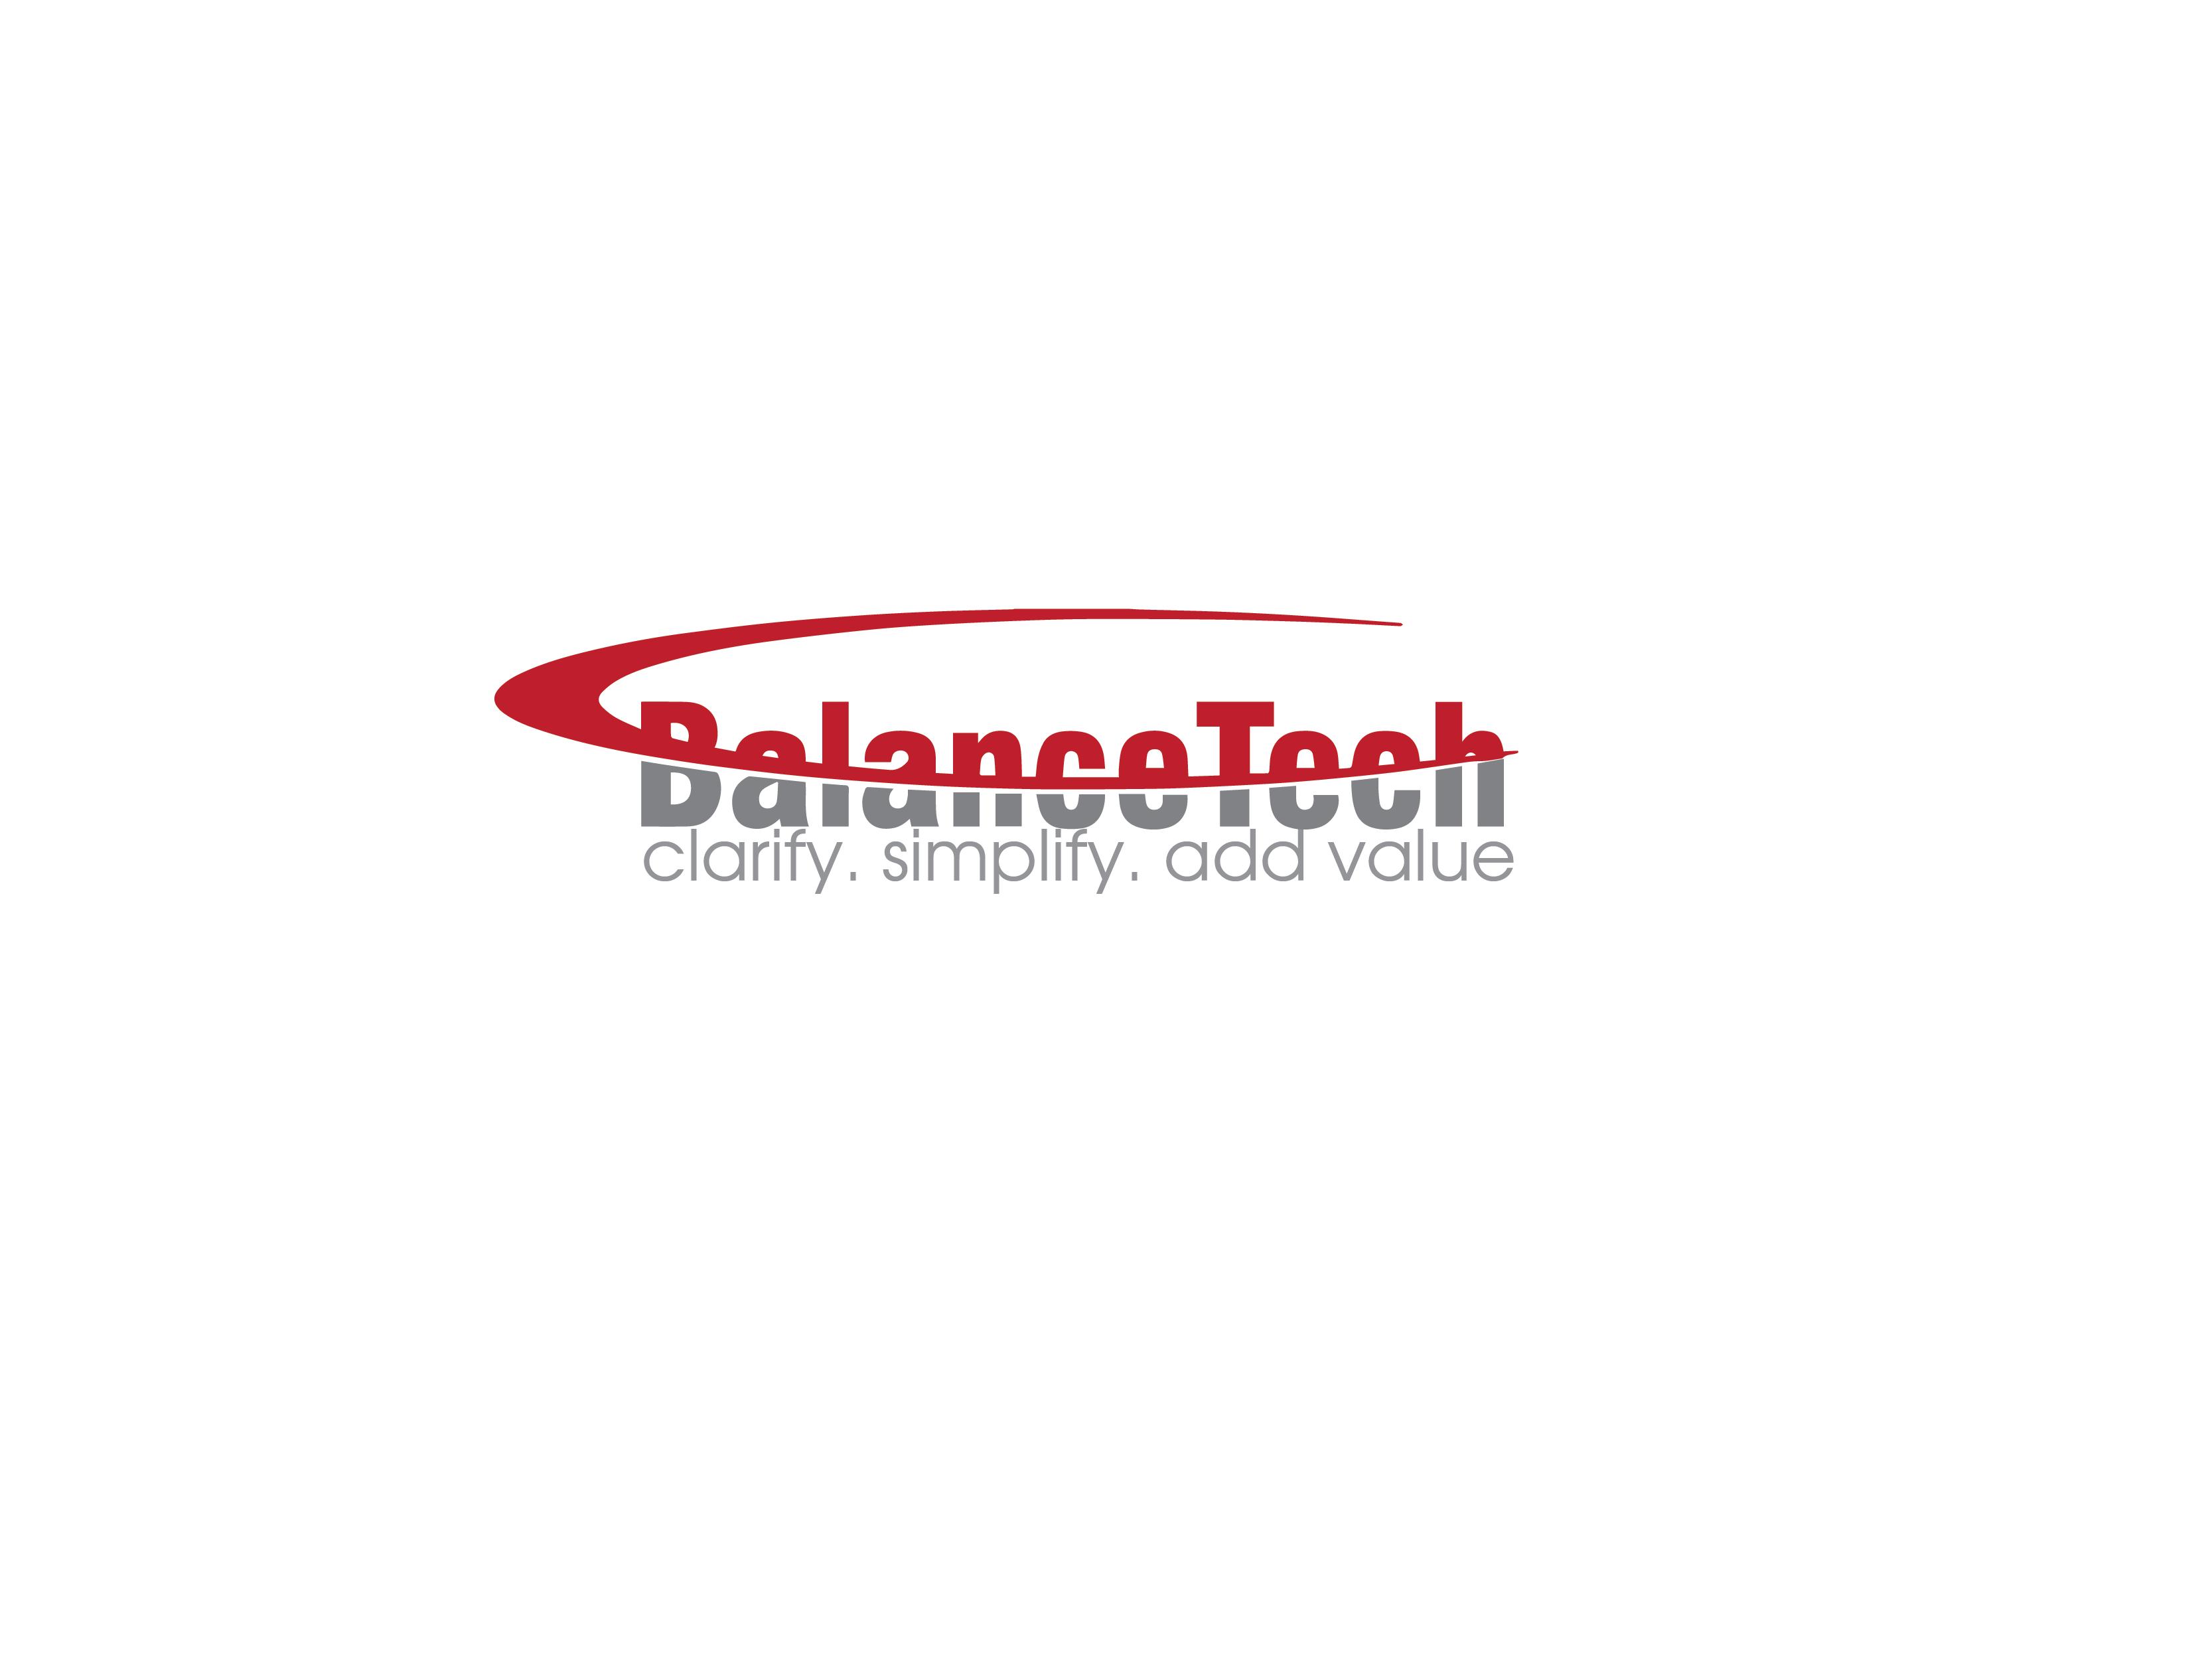 Logo Design by Private User - Entry No. 51 in the Logo Design Contest Imaginative Logo Design for BalanceTech.